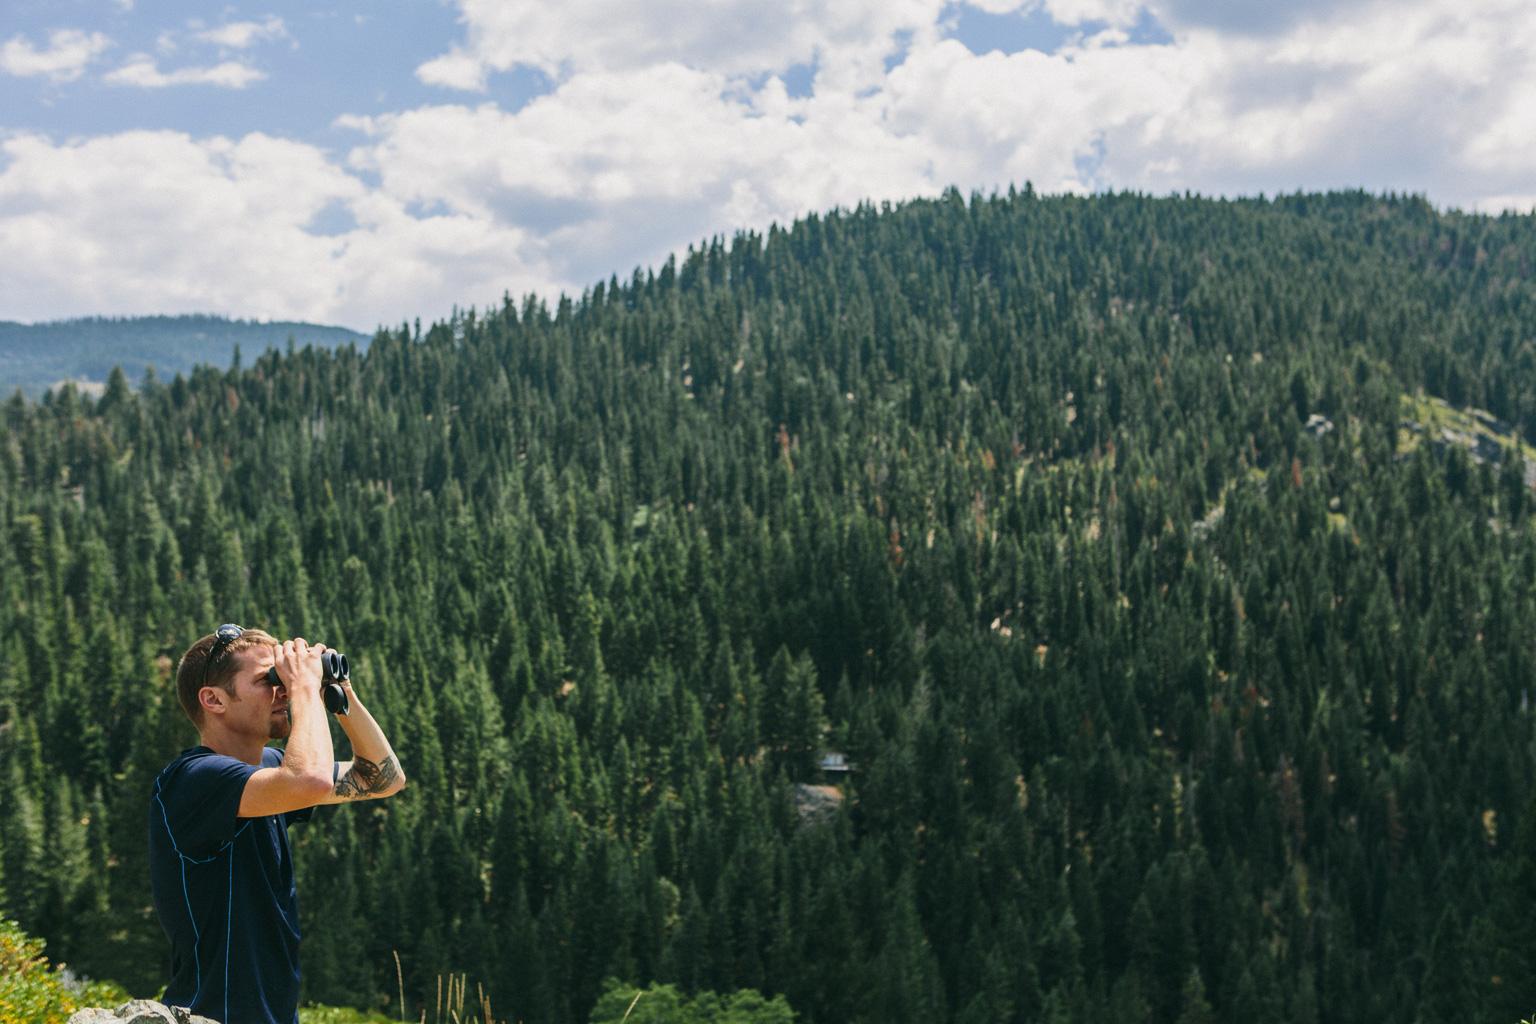 CindyGiovagnoli_outdoors_photographer_Sierra_Buttes_firetower_watchtower_Sardine_Snag_Bear_lake_hike_swim_camp-005.jpg